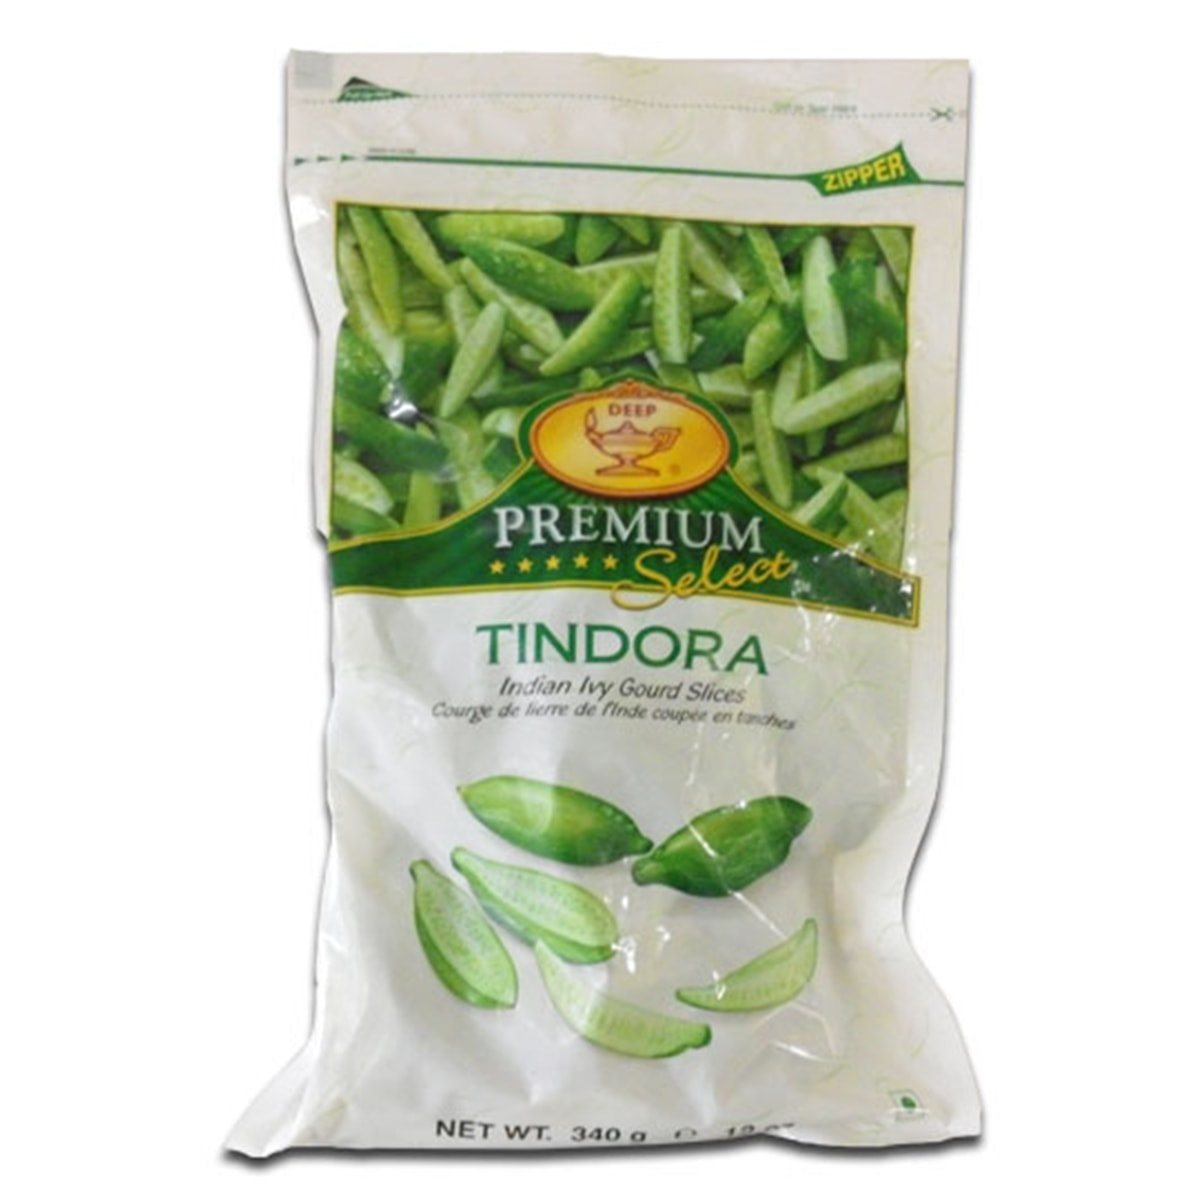 Buy Deep Foods Tindora (Indian Ivy Gourd Slices) Frozen - 340 gm